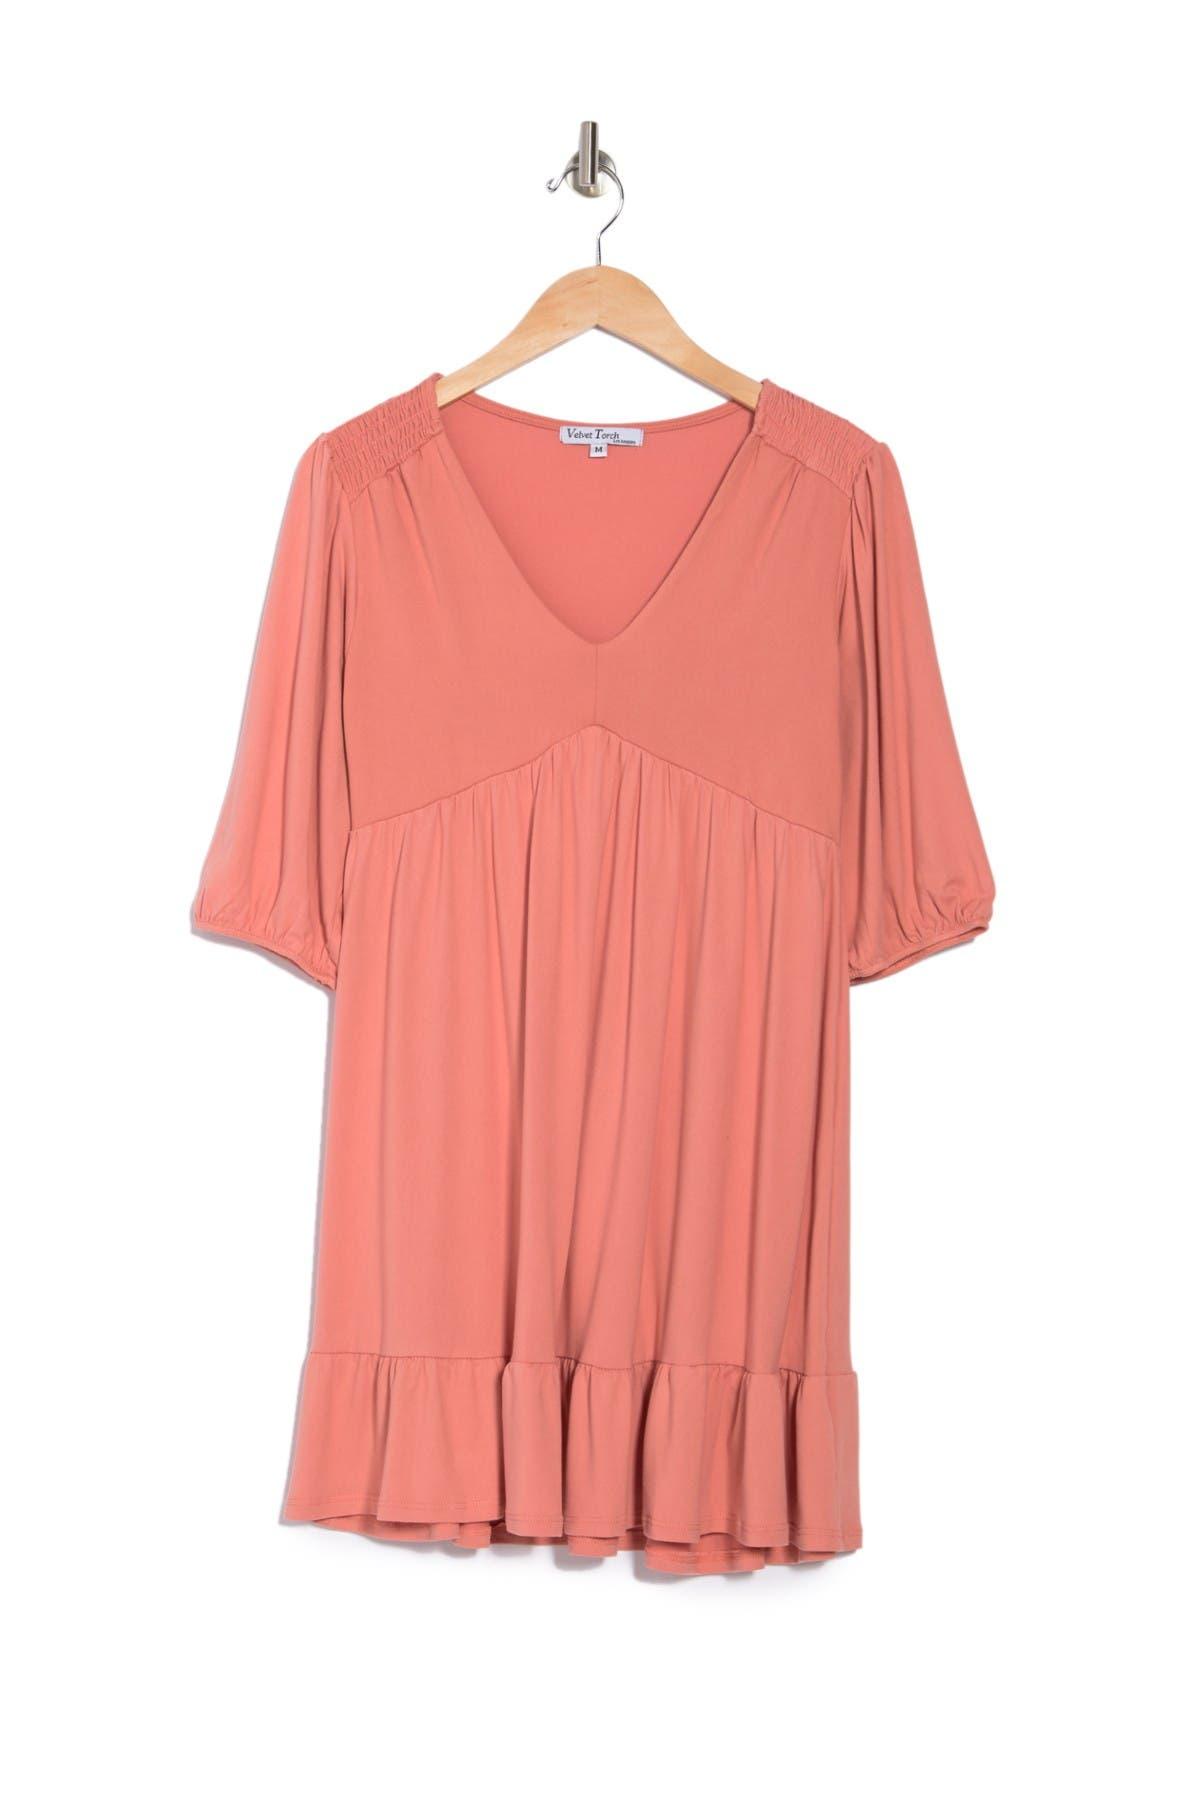 Image of Velvet Torch Square Neck Tie Dye Ribbed Knit Dress